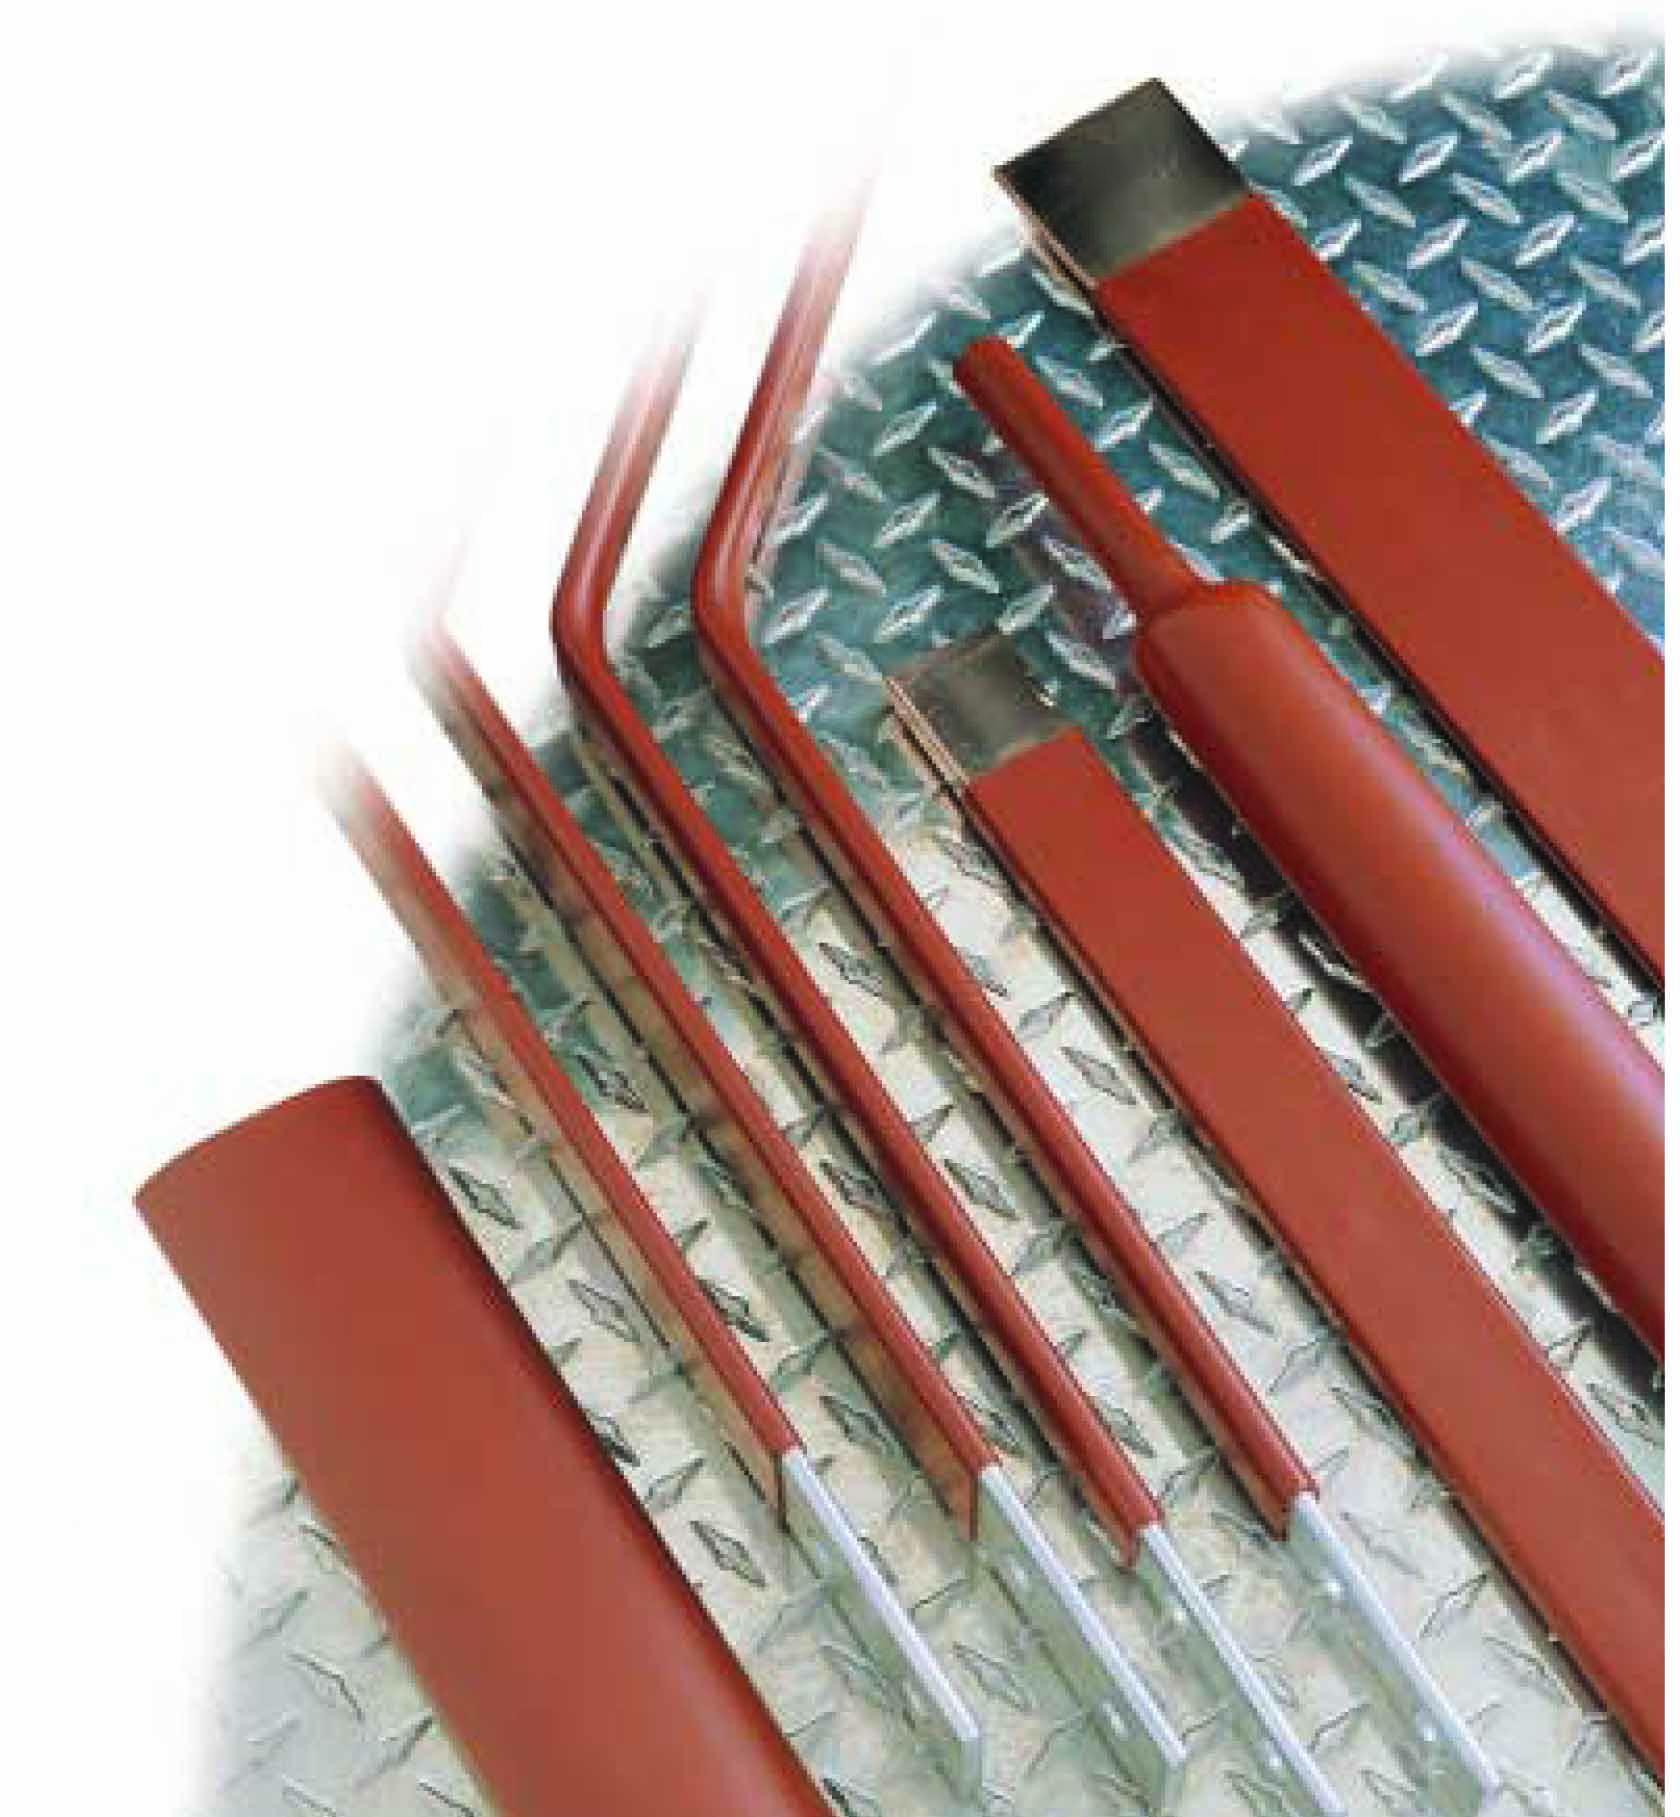 Medium voltage crosslinked polyolefin bus bar tubing - CBTM